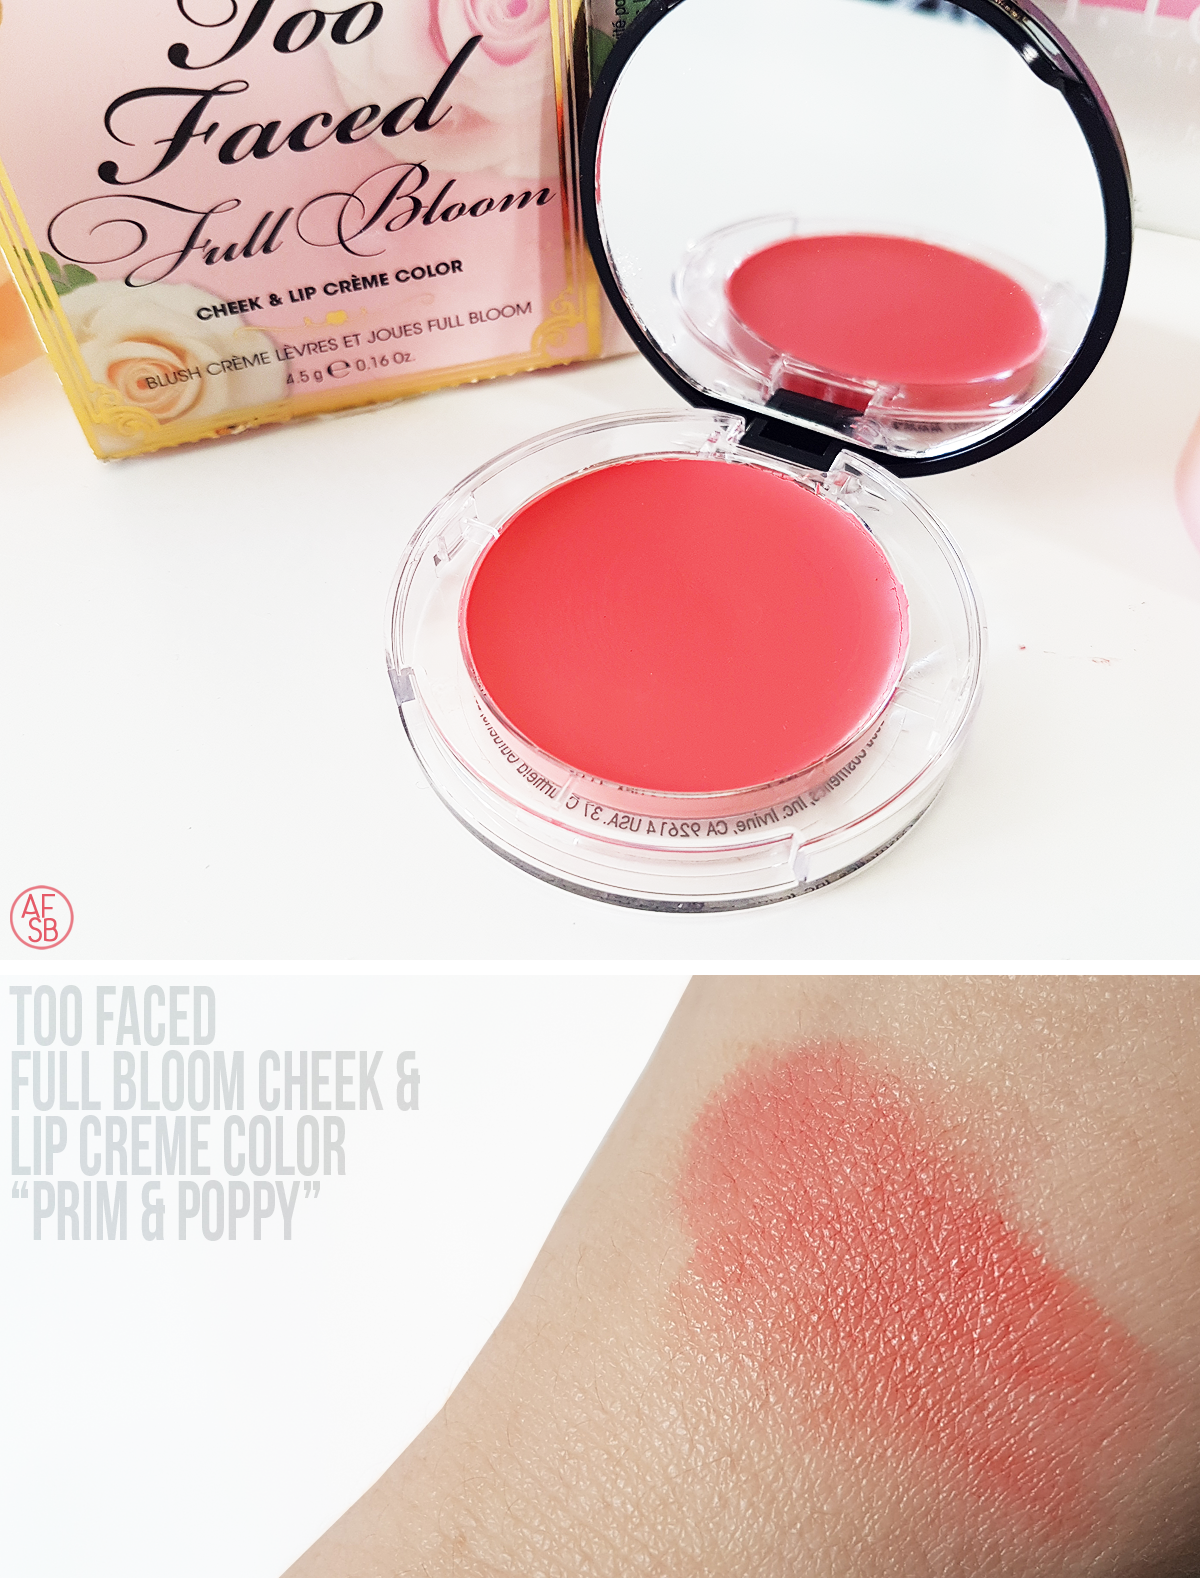 Too Faced - Full Bloom Cheek & Lip Creme Color in Prim & Poppy